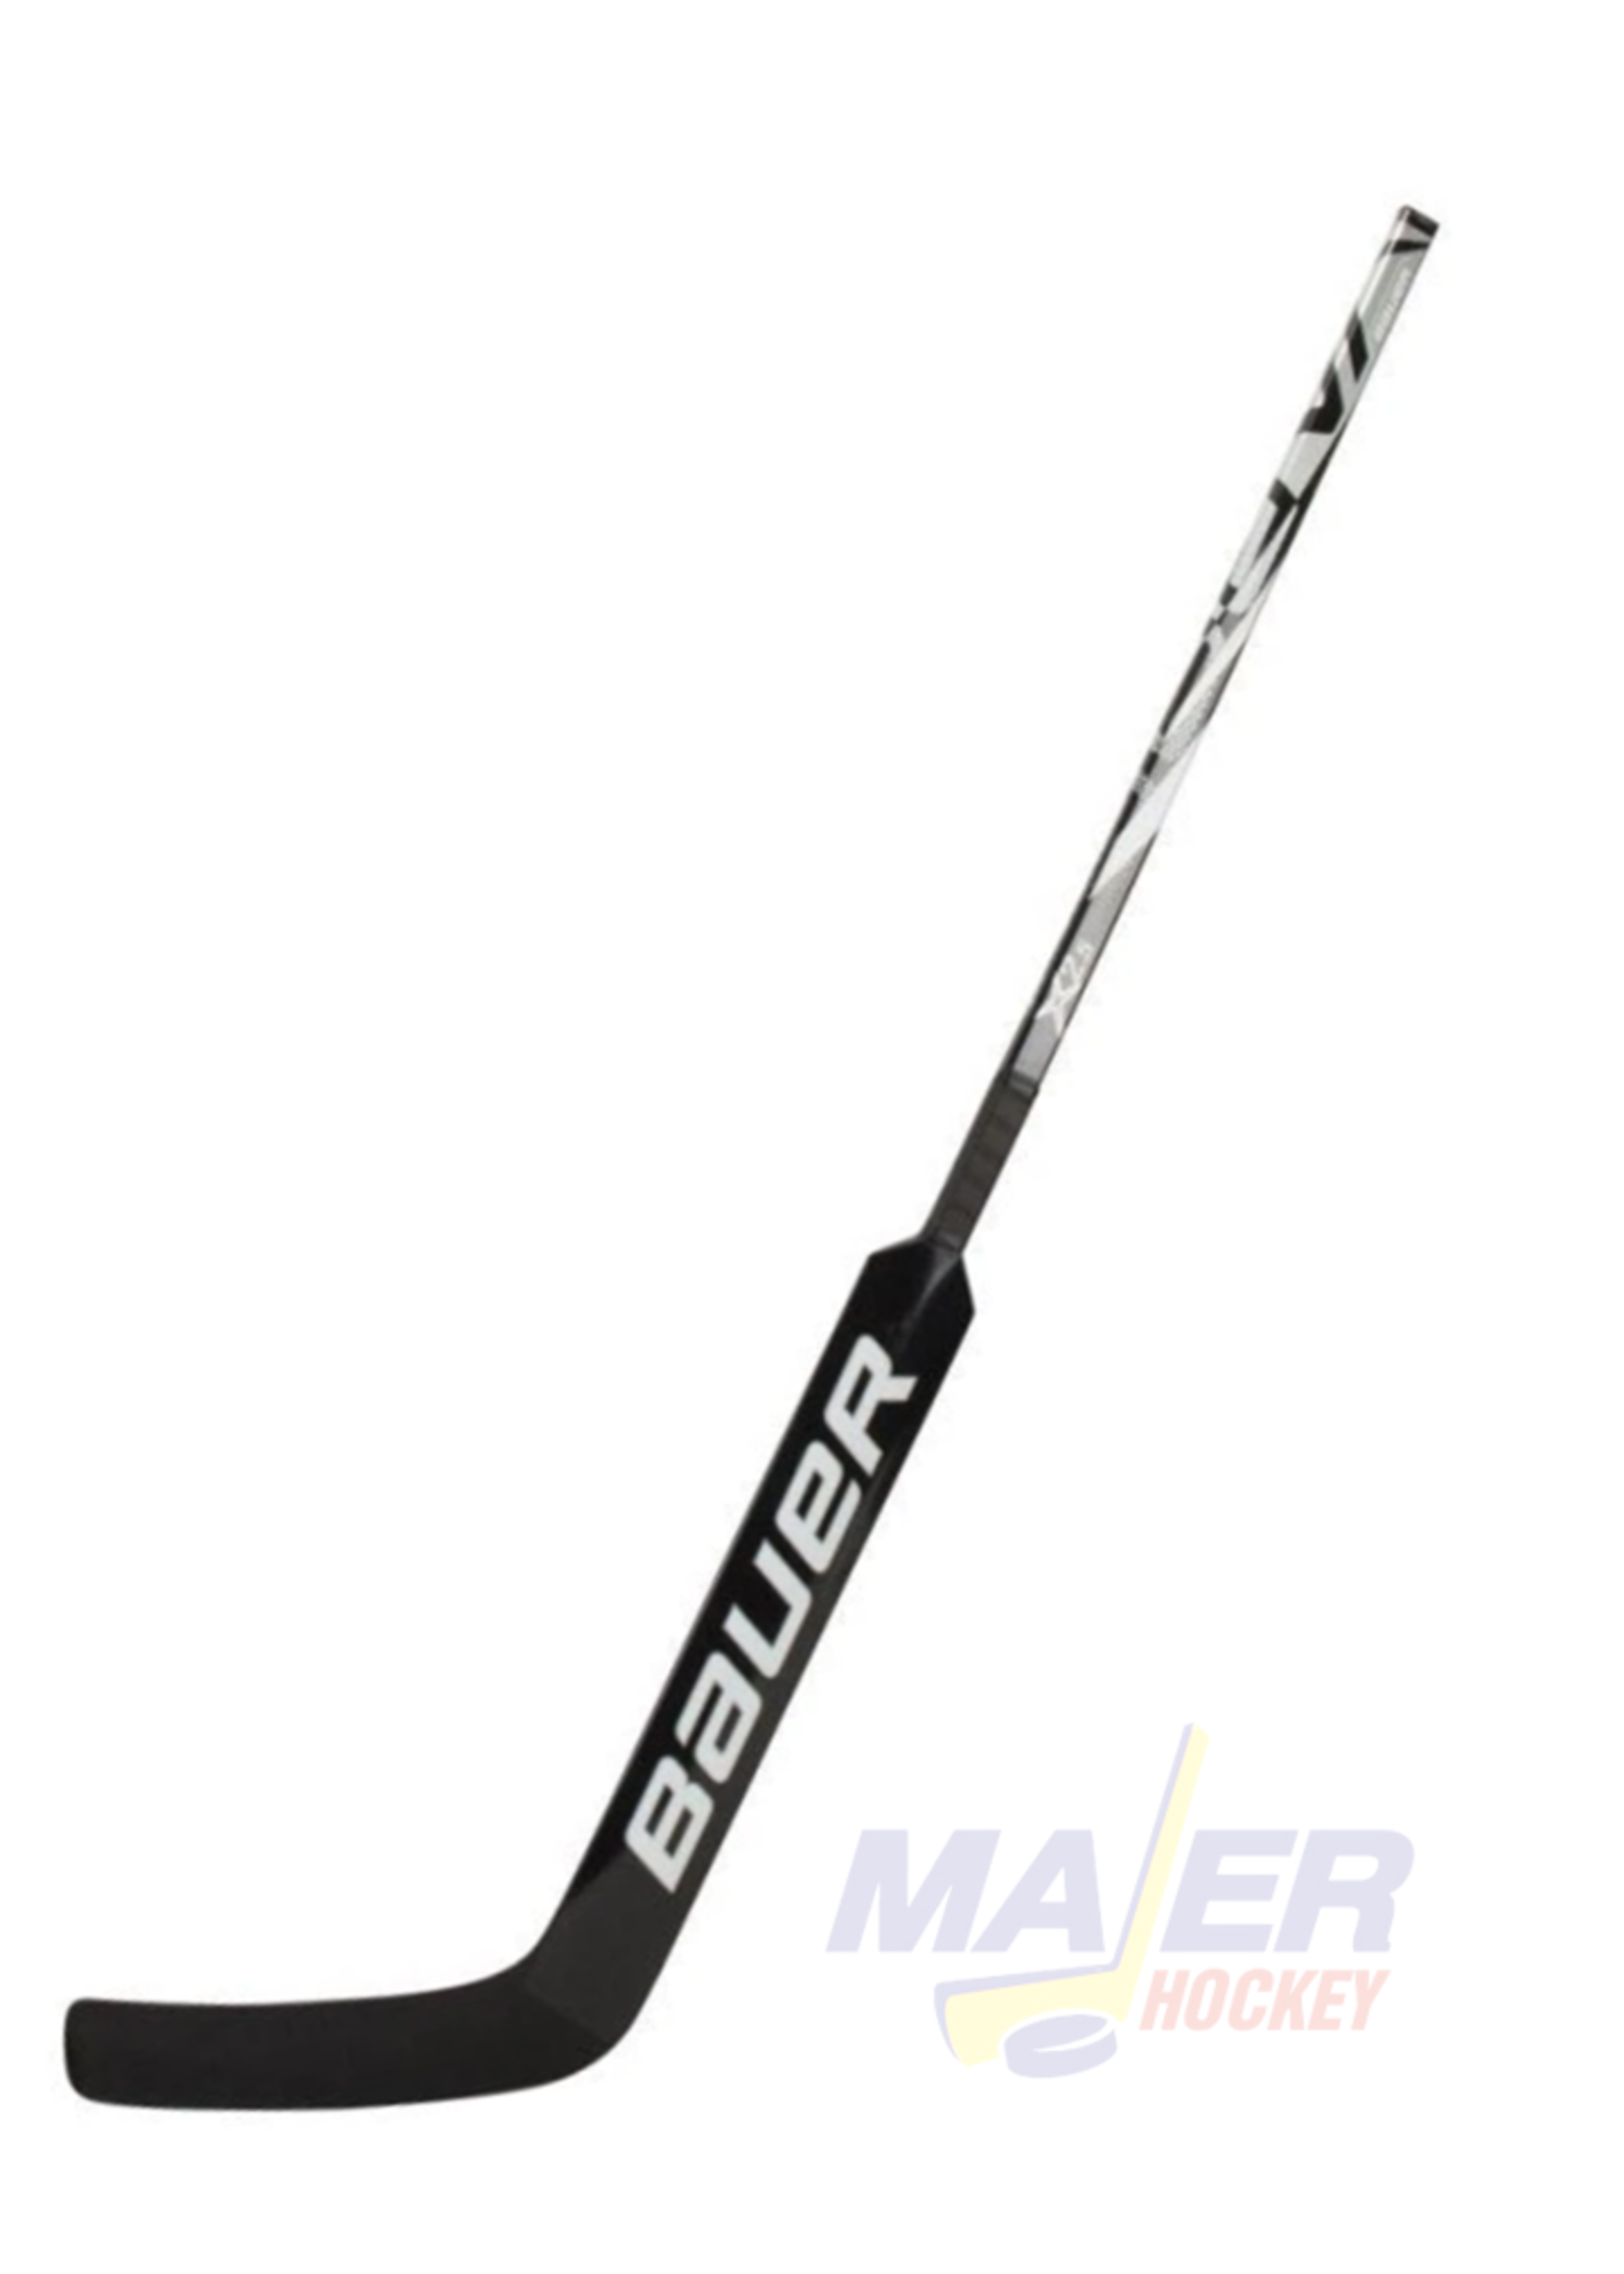 Bauer Vapor X2.5 Sr Goalie Stick - Left